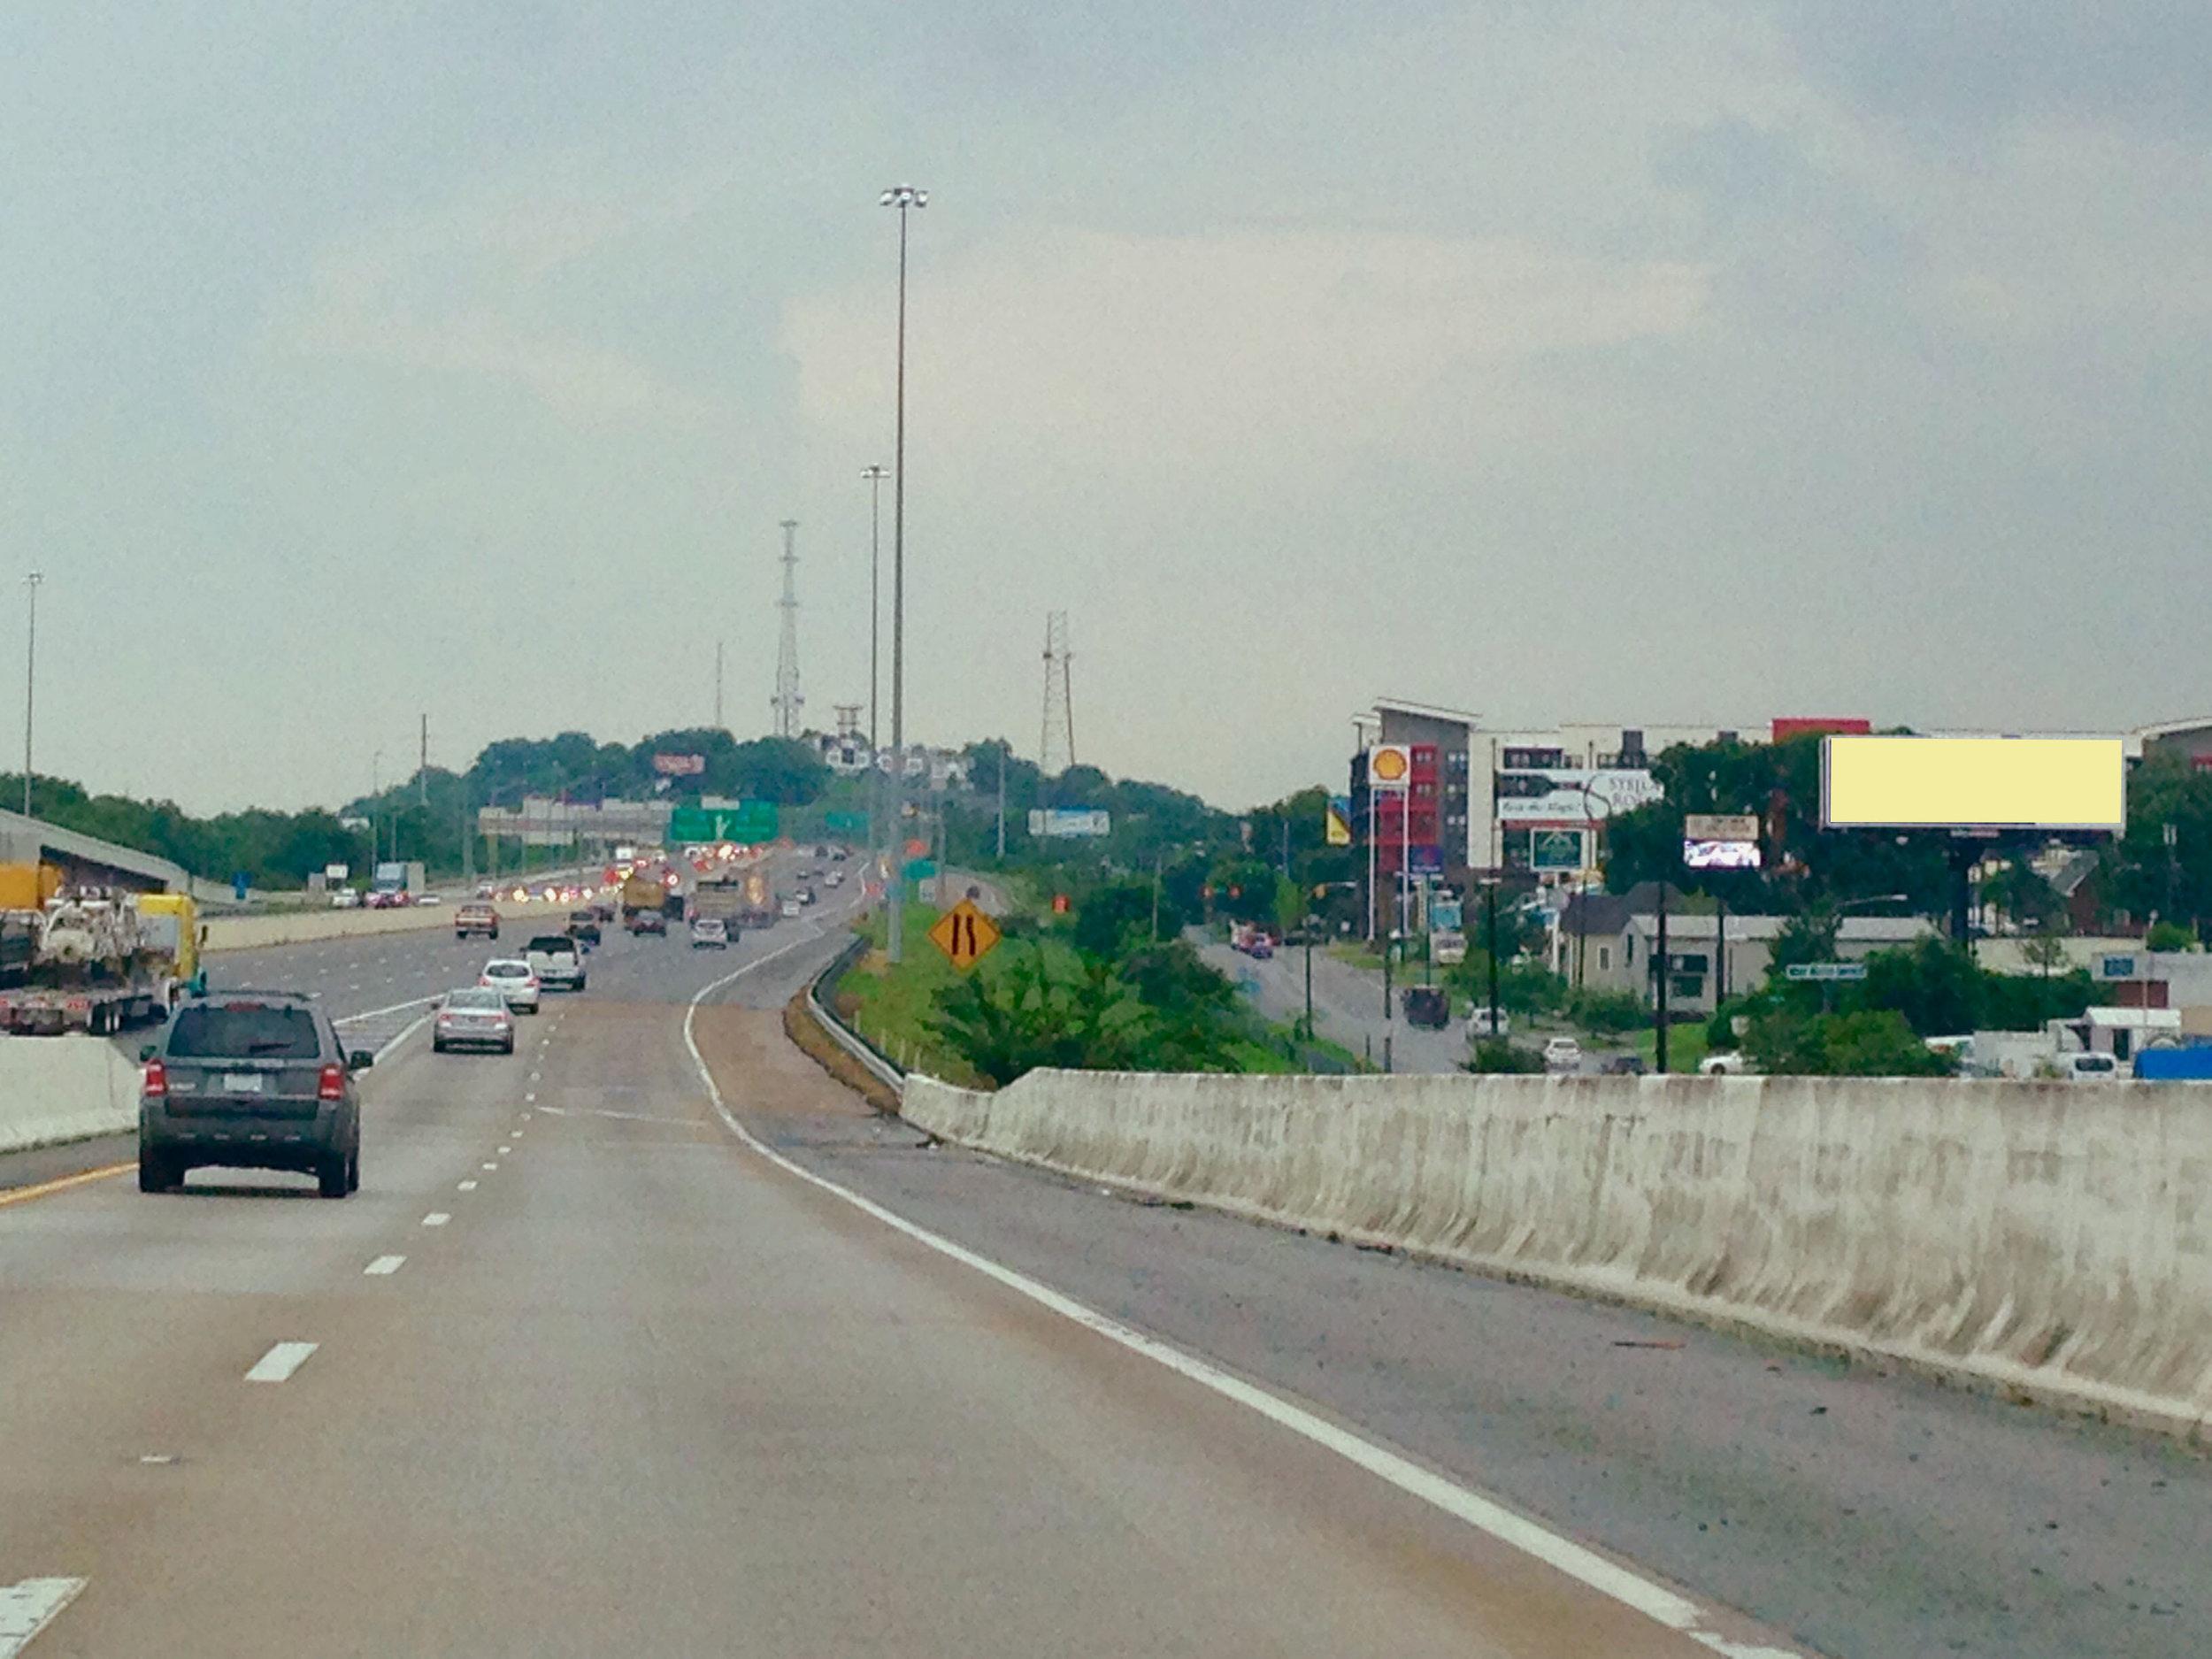 Nashville billboard